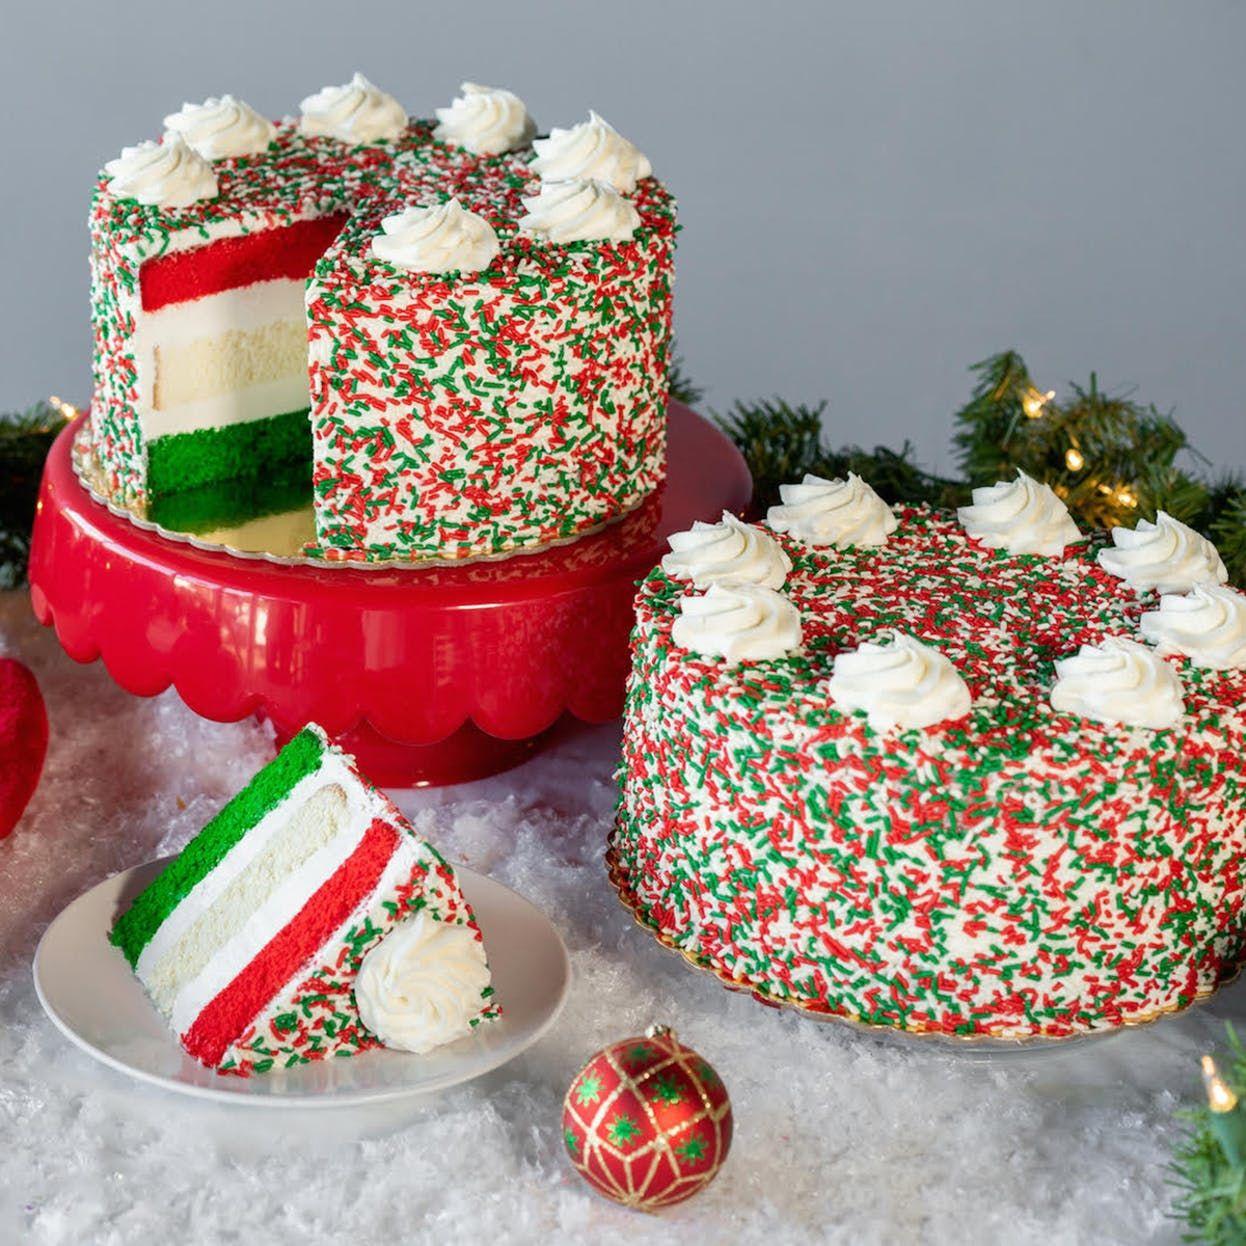 Christmas Cake 10 In 2020 Christmas Cake Vanilla Buttercream Icing Yummy Cakes